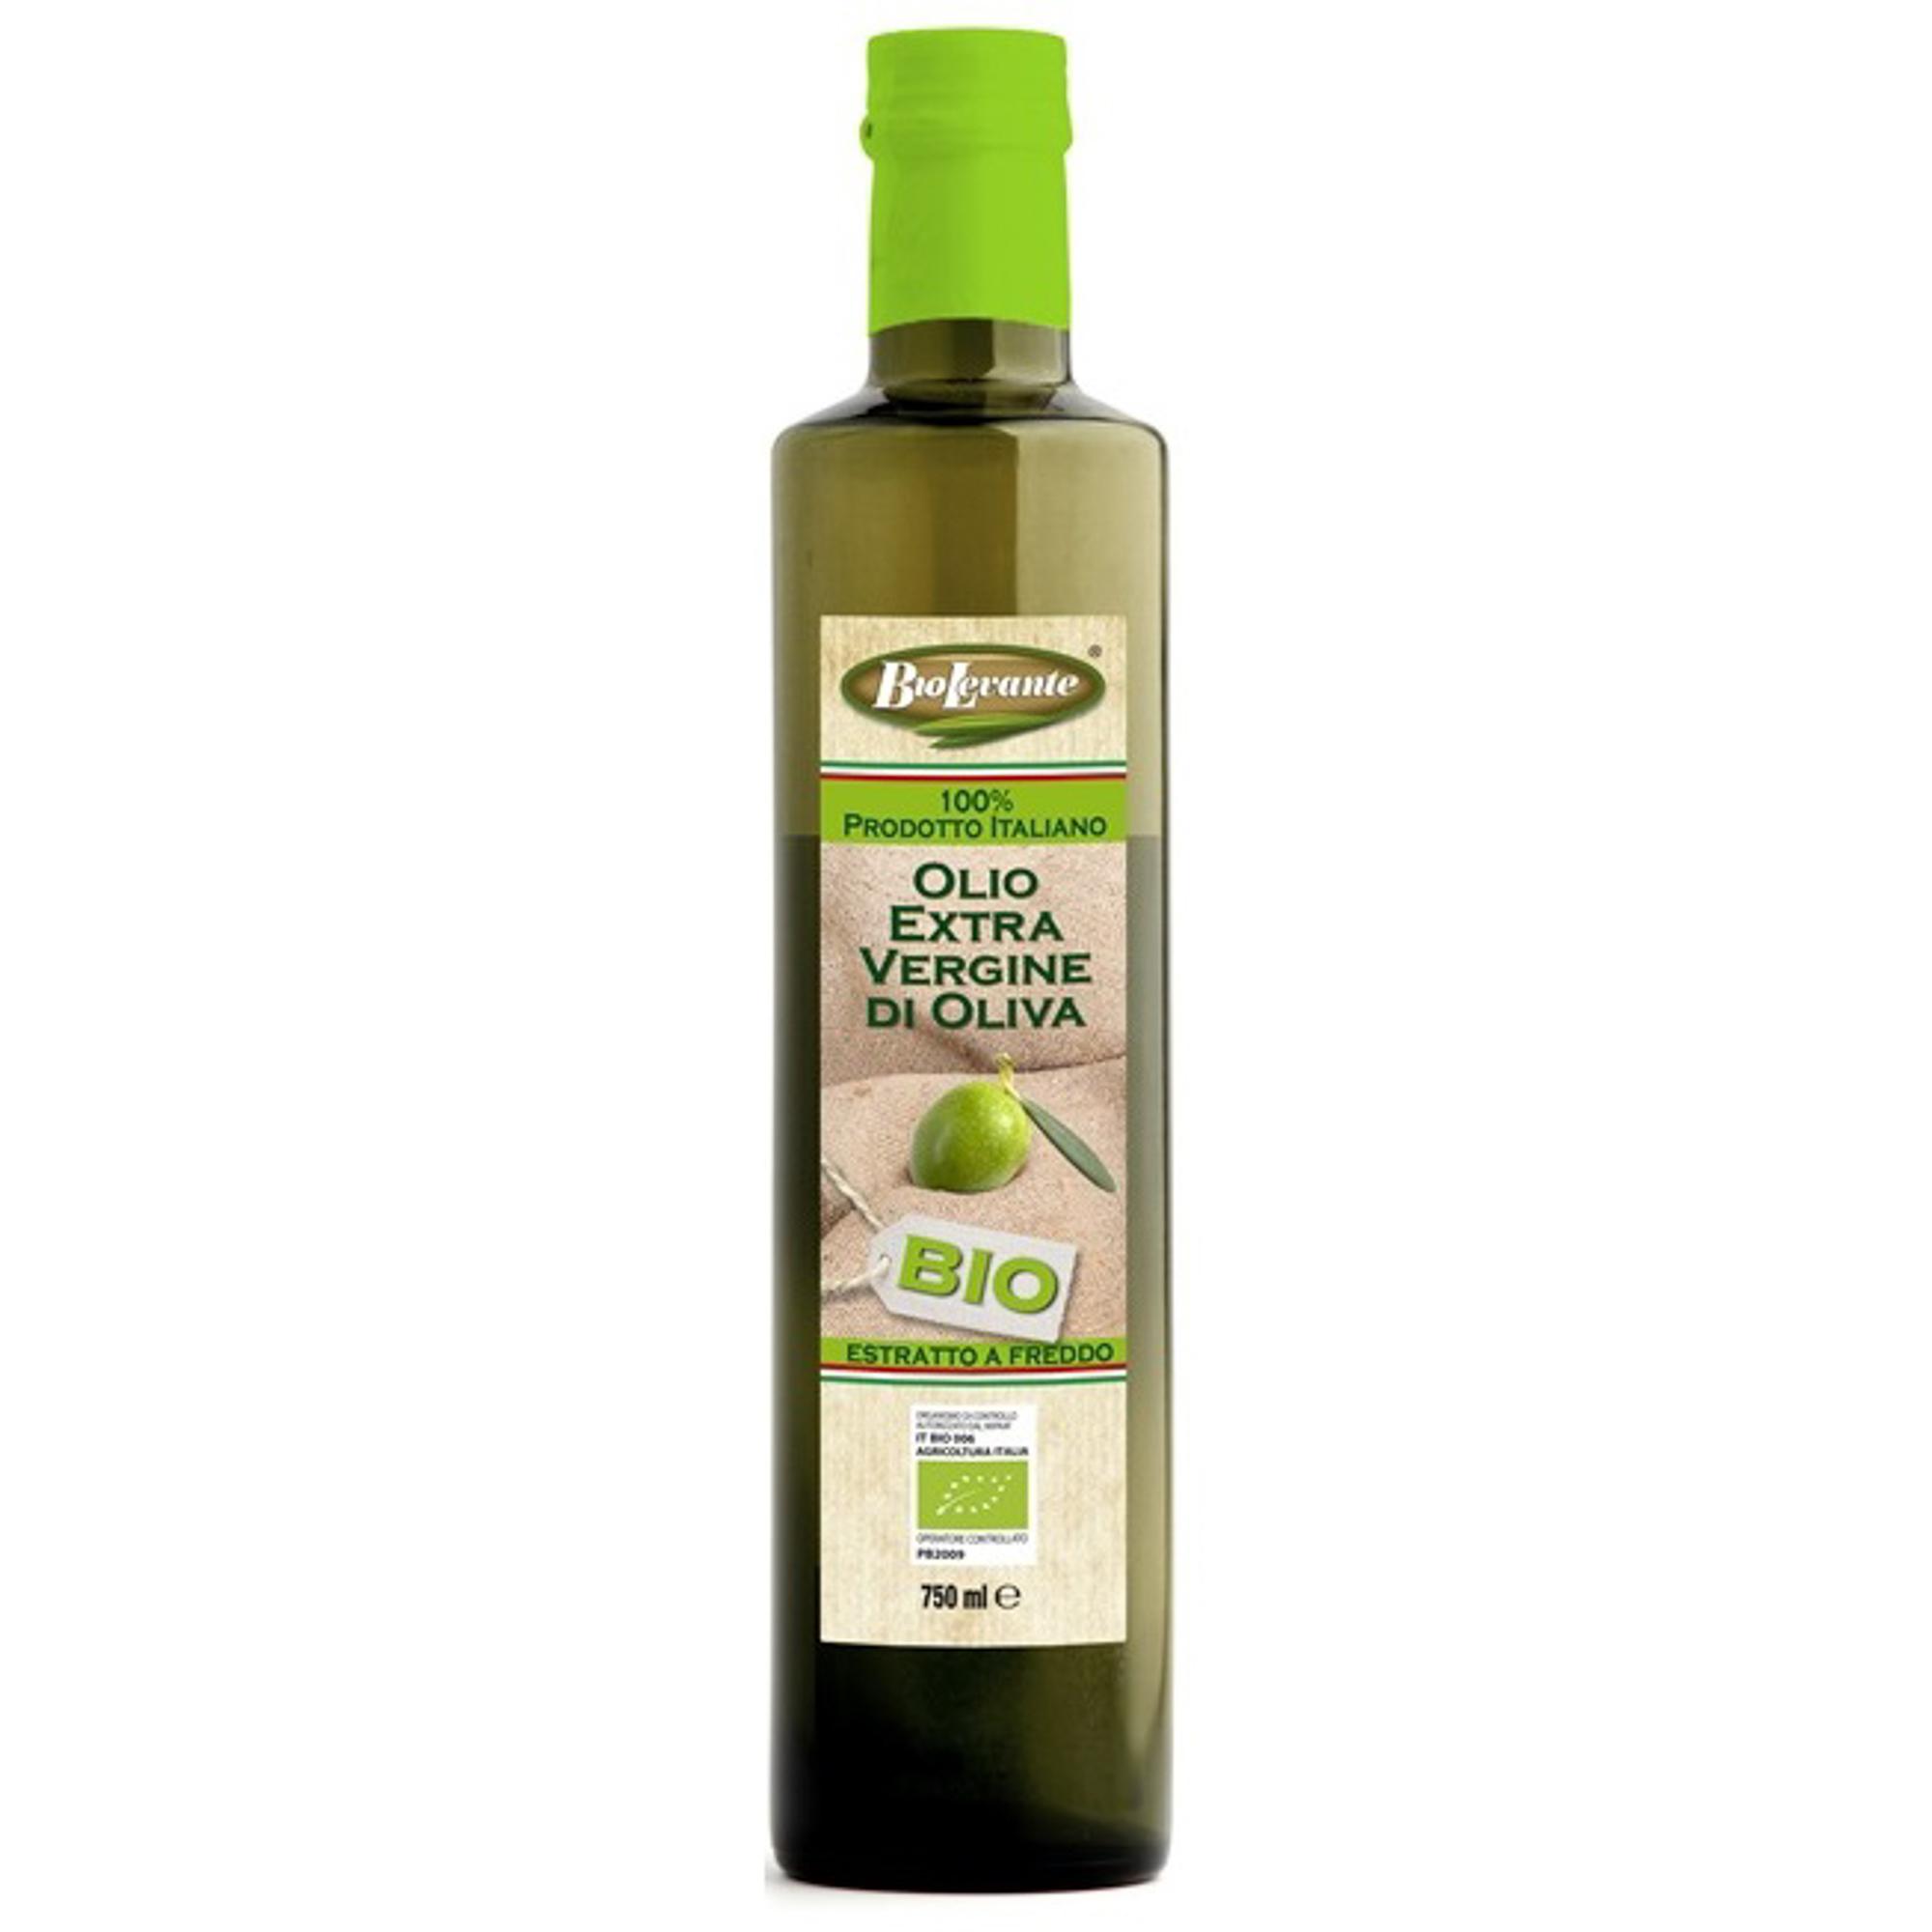 Масло оливковое Biolevante Extra Virgin 500 мл масло оливковое farchioni extra virgin di oliva 500 мл